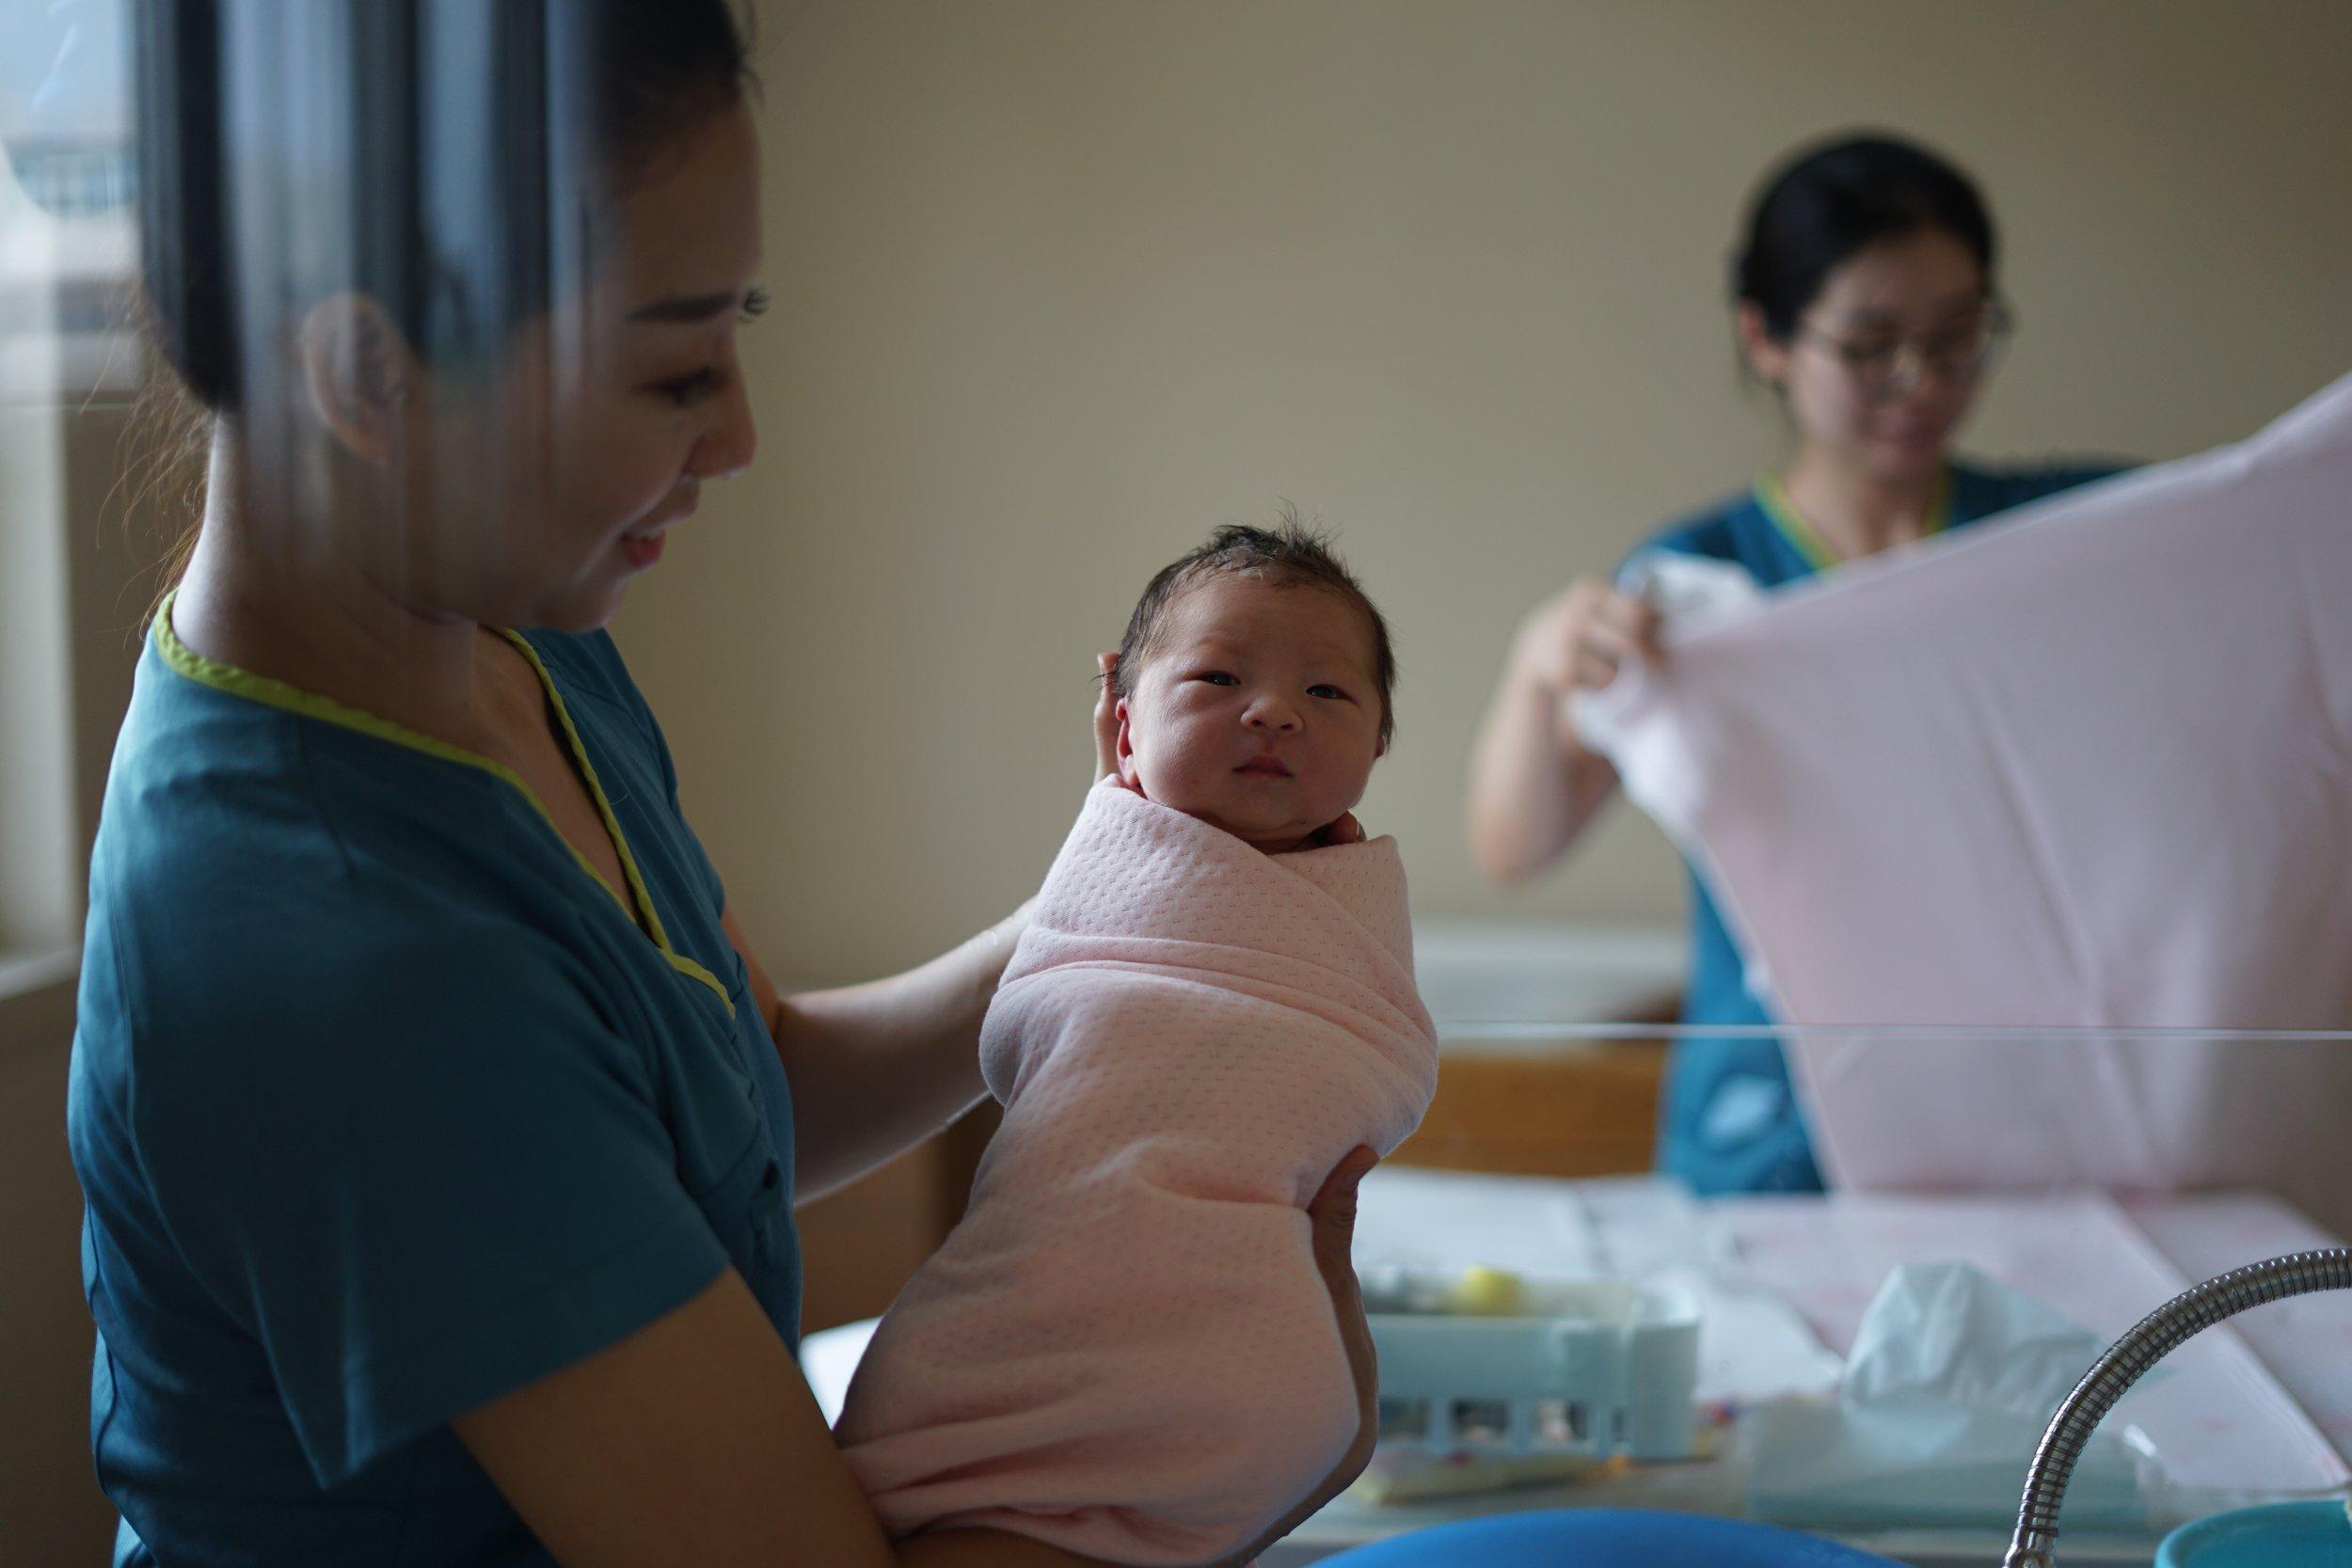 nurse wang-dongxu-777822-unsplash.jpg